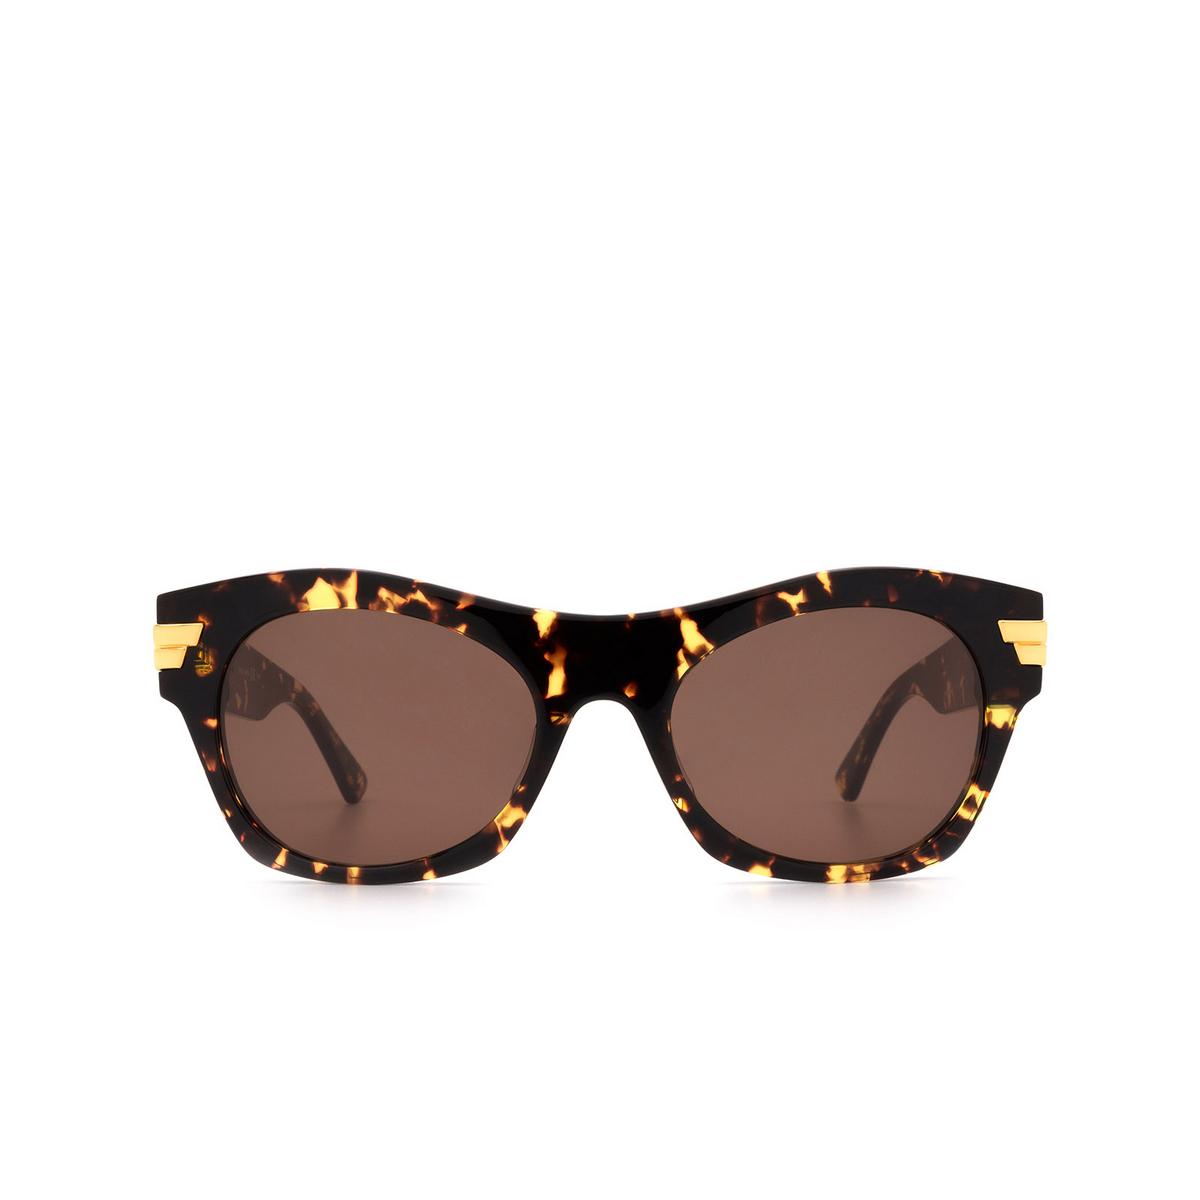 Bottega Veneta® Square Sunglasses: BV1103S color Havana 002 - front view.